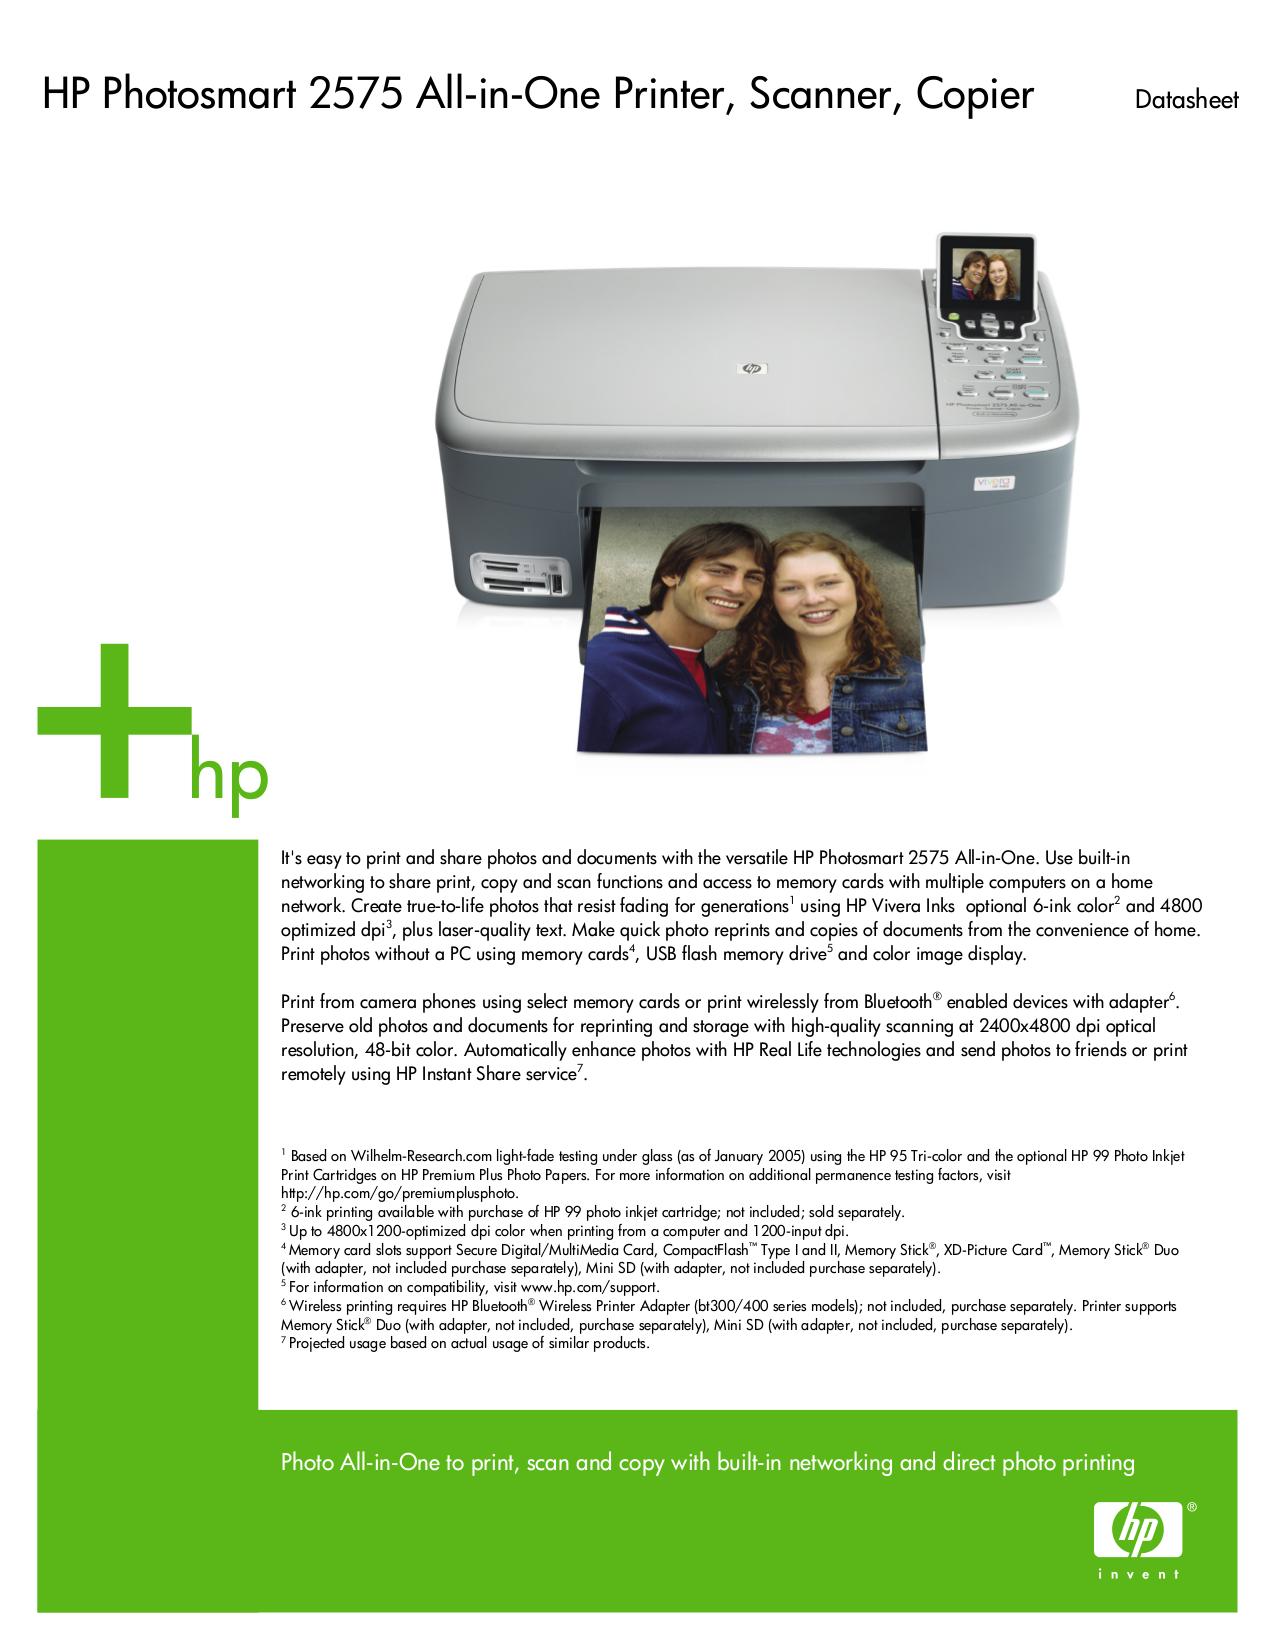 download free pdf for hp photosmart 7400 printer manual rh umlib com HP All in One Desktop Manuals HP Product Manuals